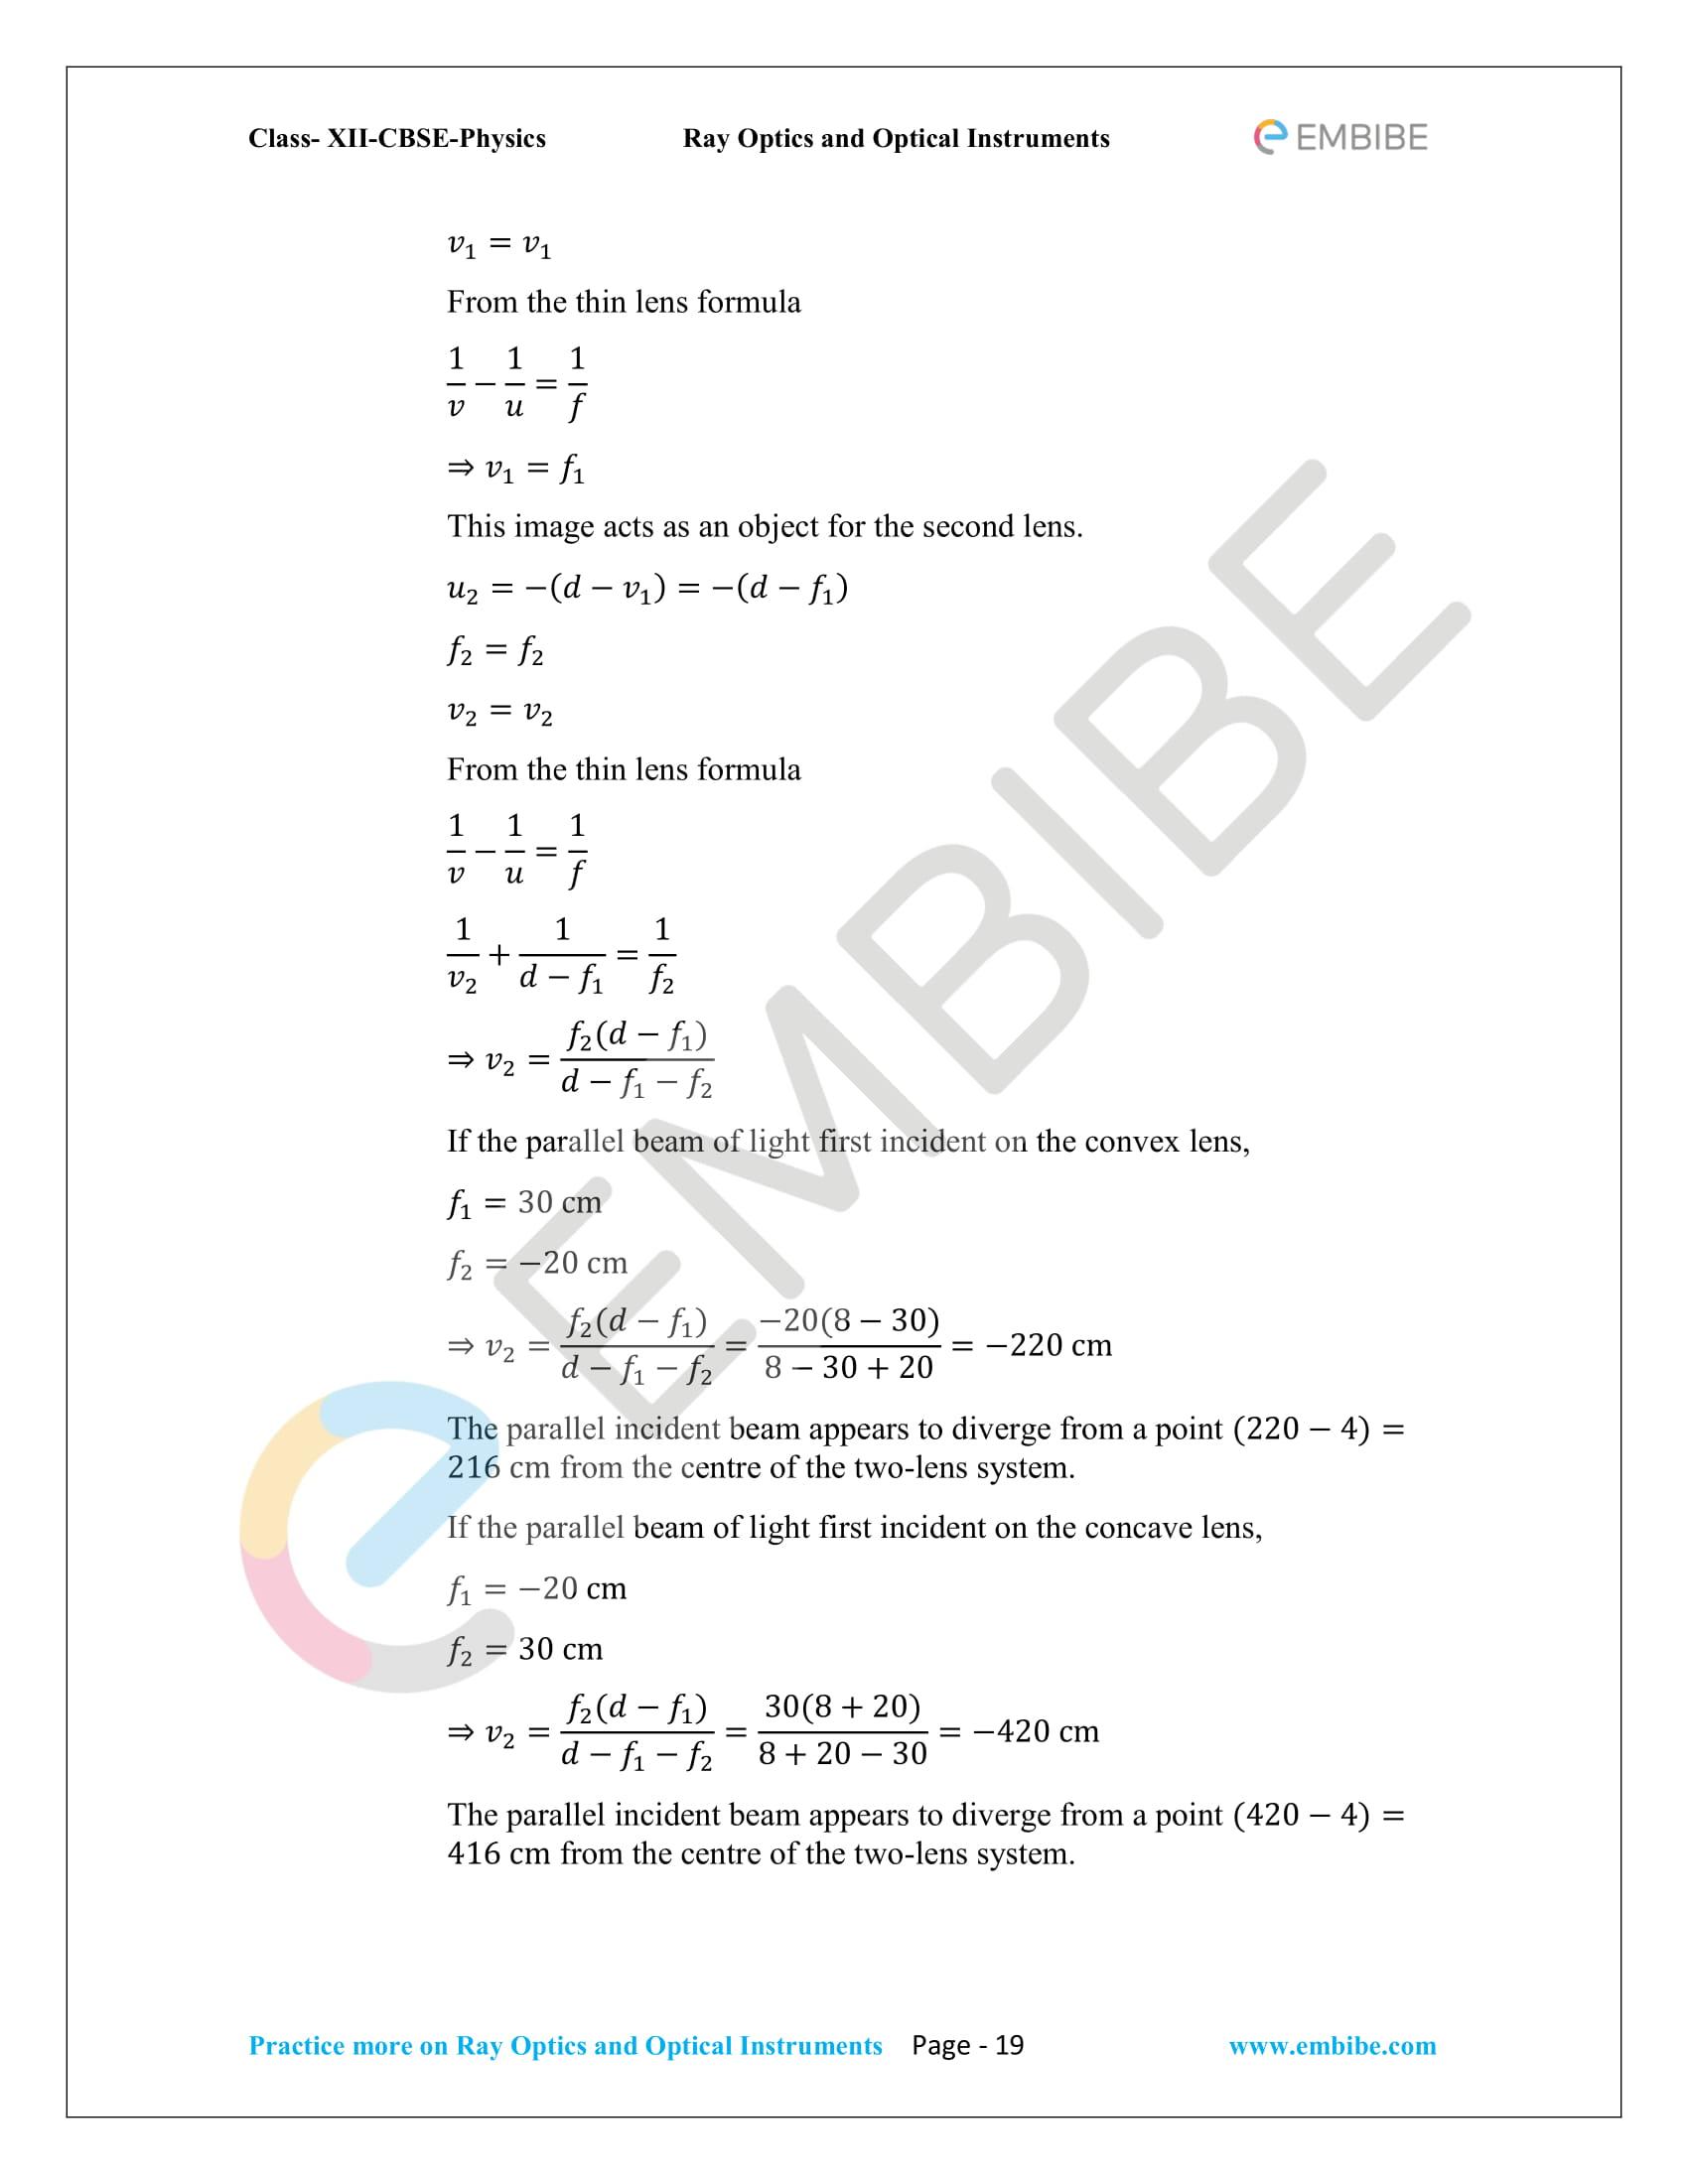 NCERT_Grade 12_Physics_Ch_09_Ray Optics-19